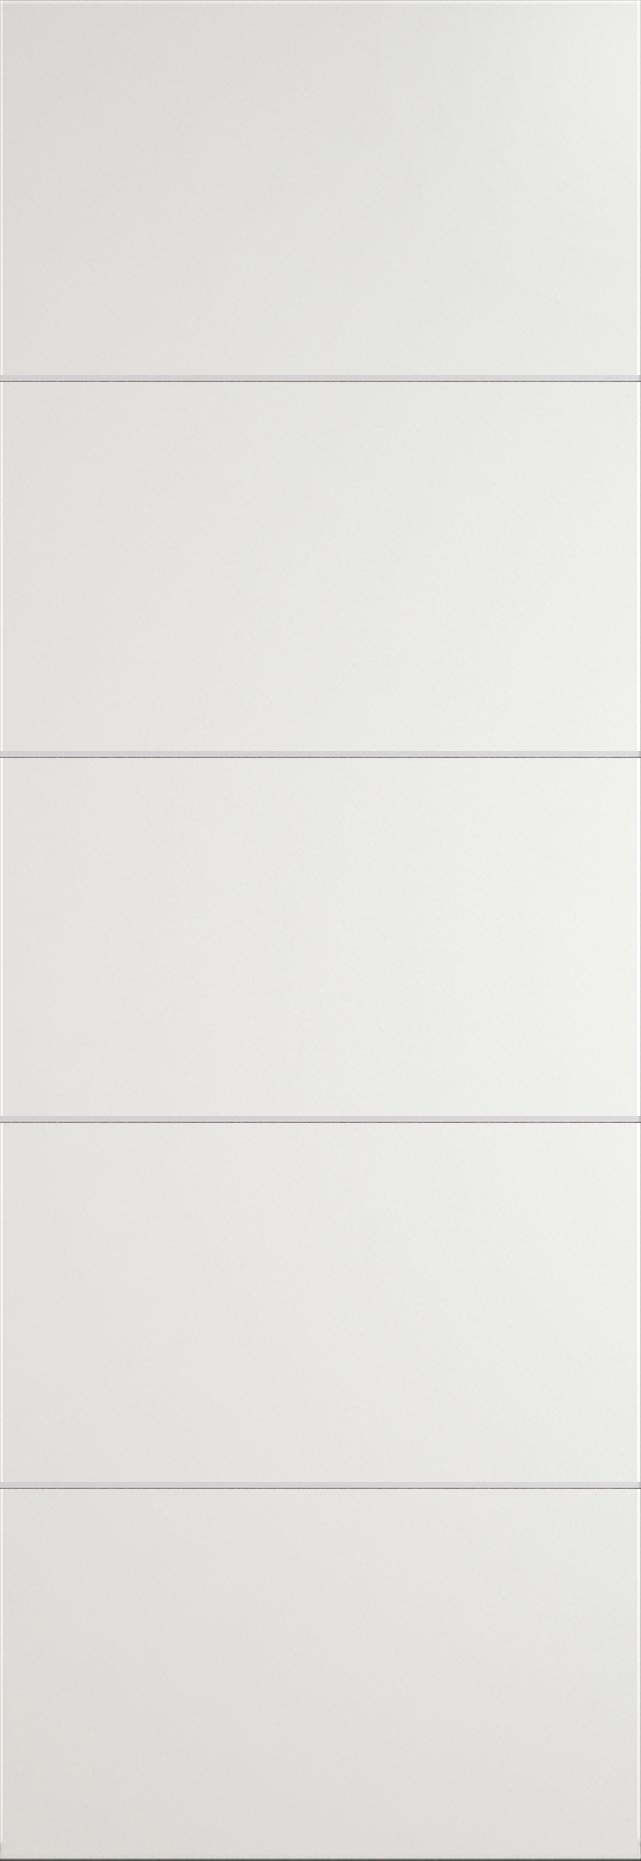 Tivoli Д-3 Invisible цвет - Бежевая эмаль Без стекла (ДГ)